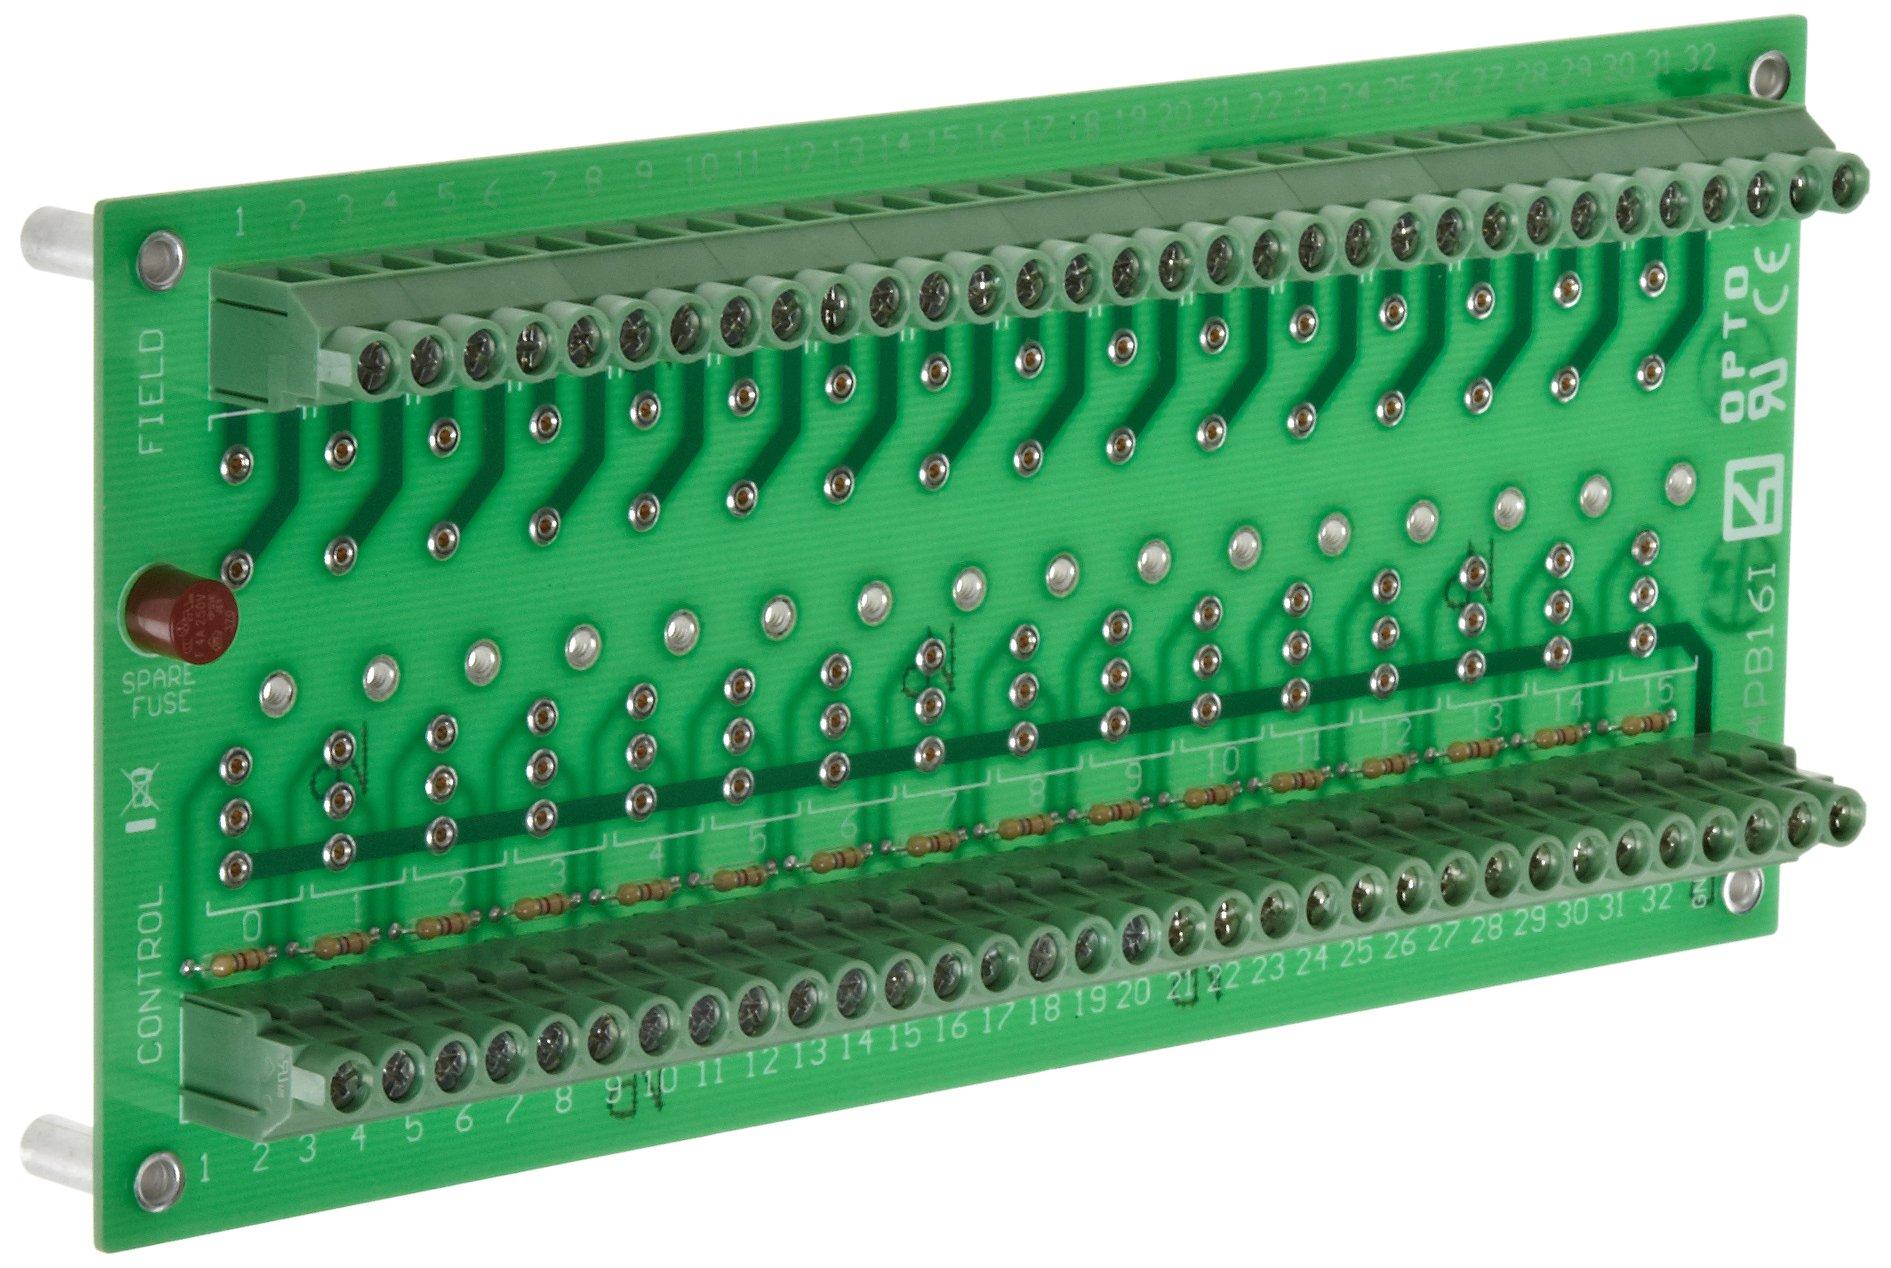 Opto 22 G4PB16I G4 16 Channel I/O Module Rack Isolated Control